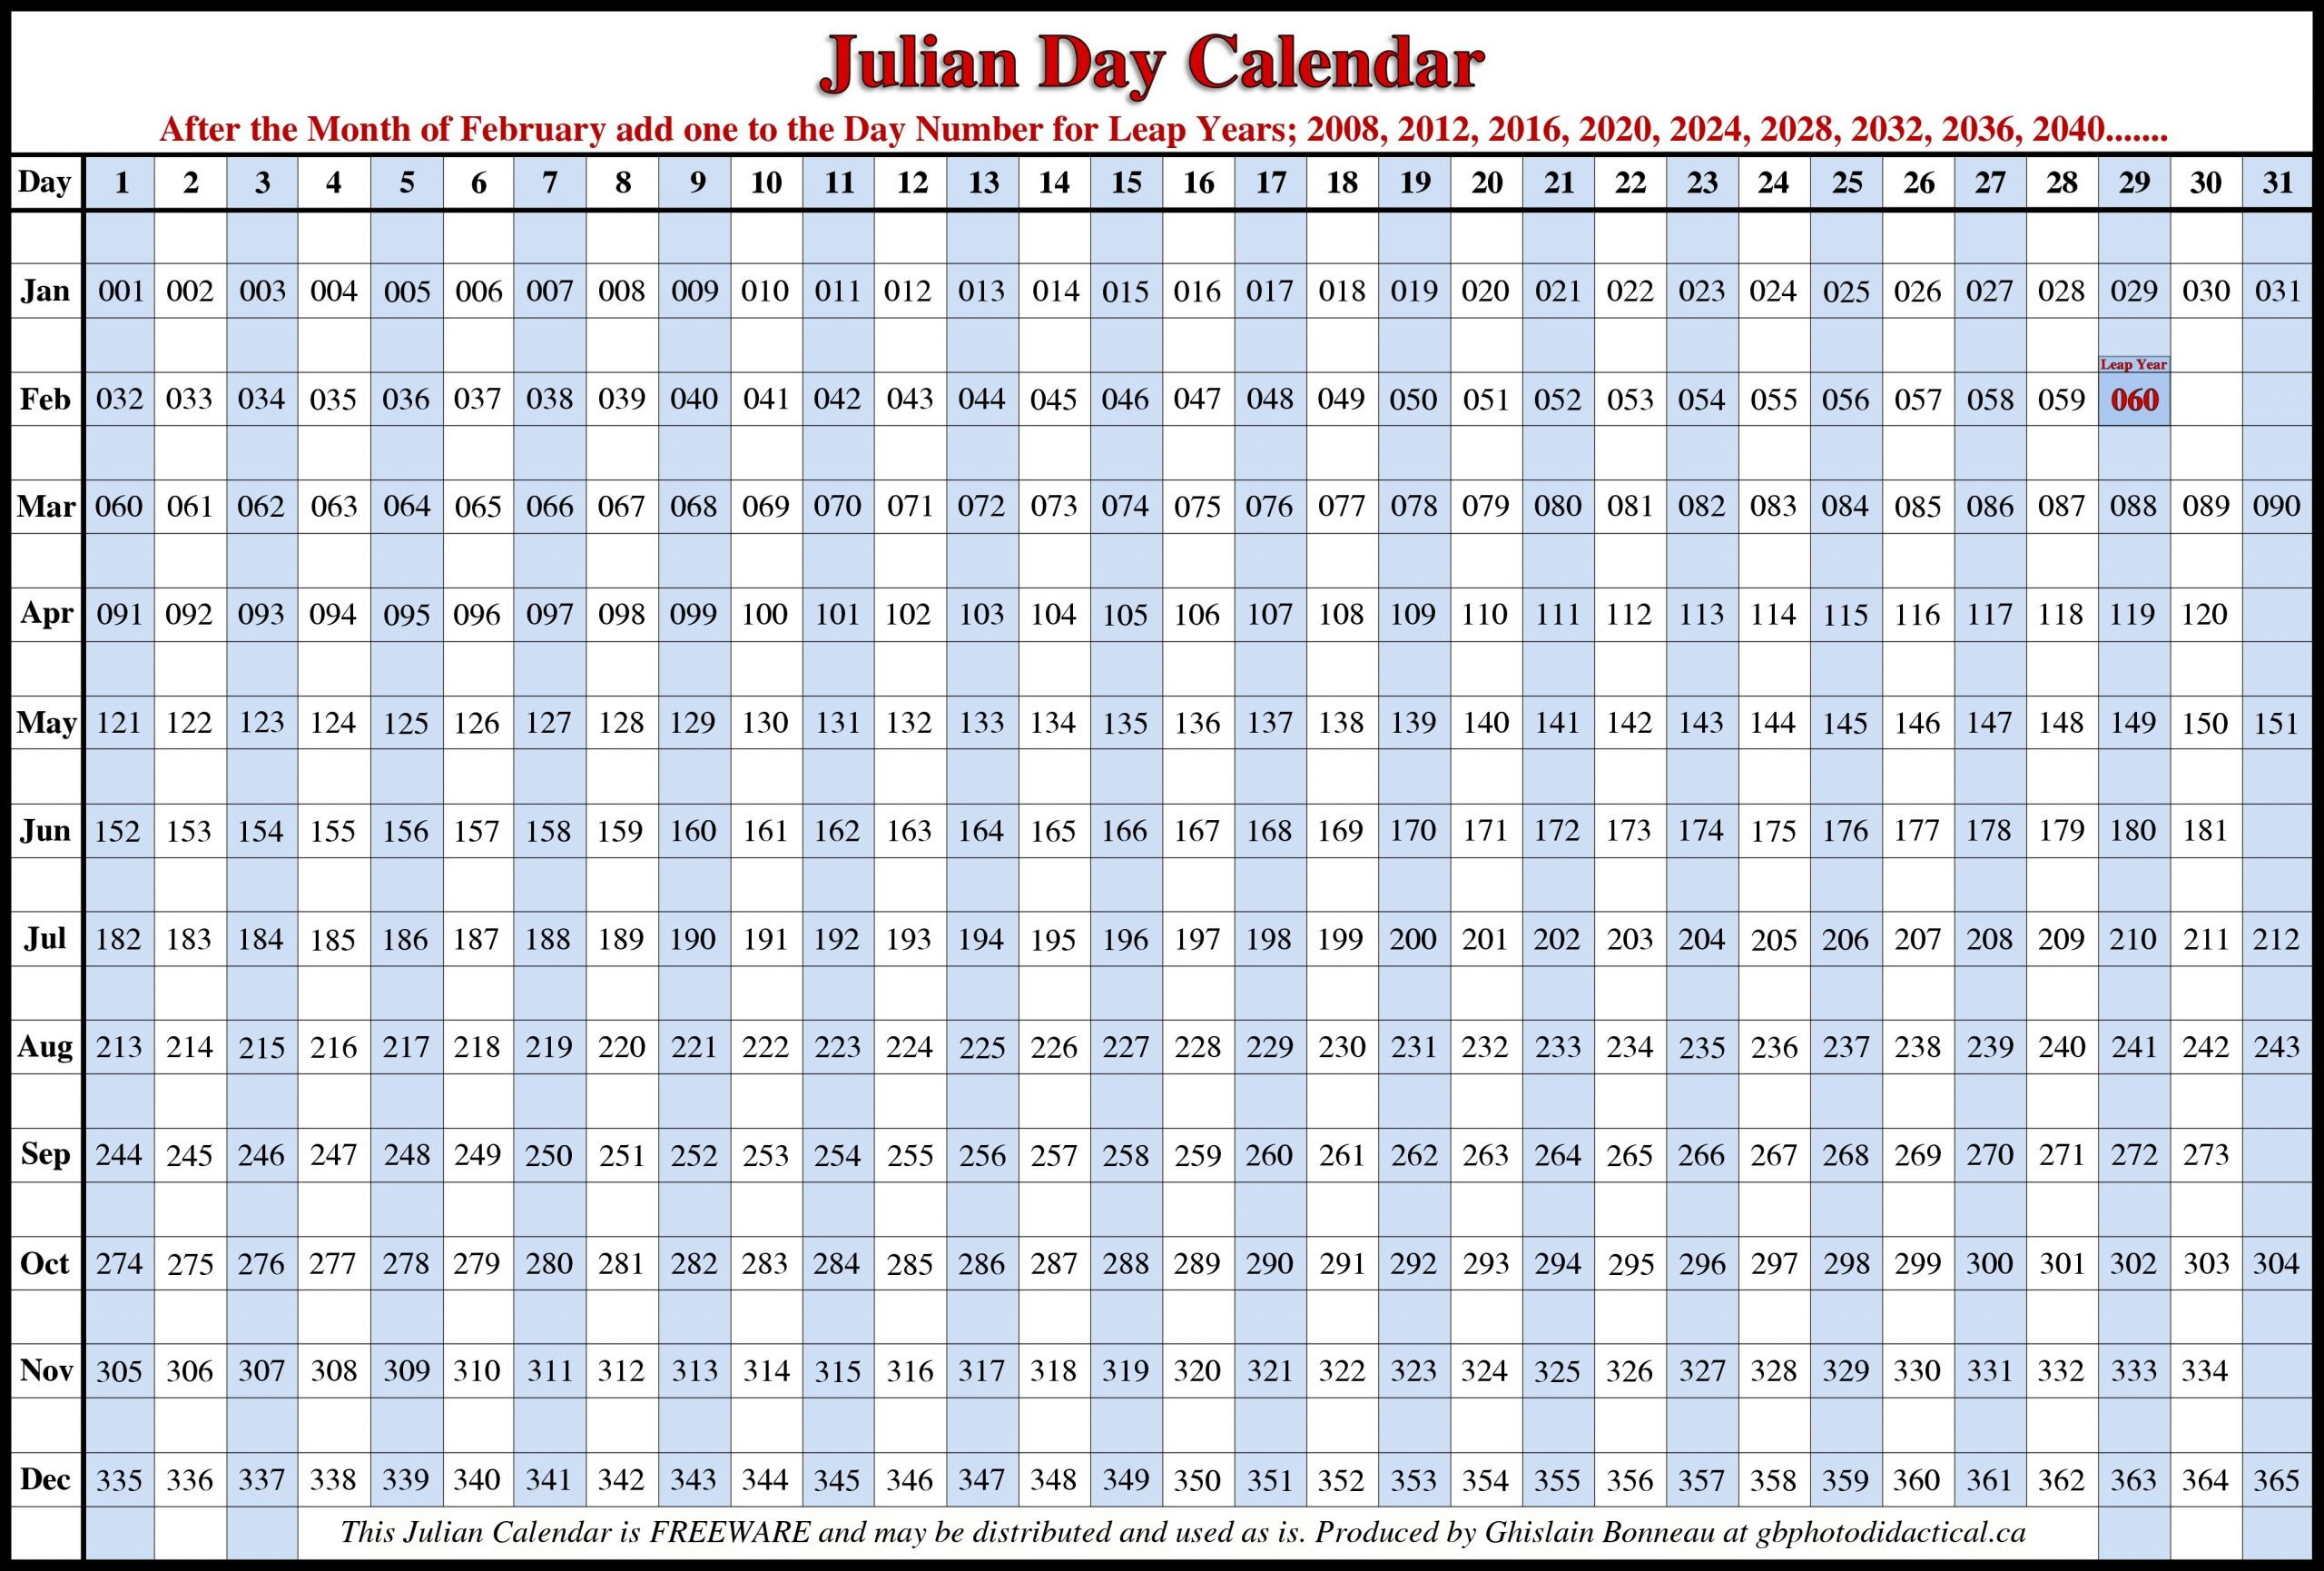 Calendario Juliano 2020 - Teke.wpart.co